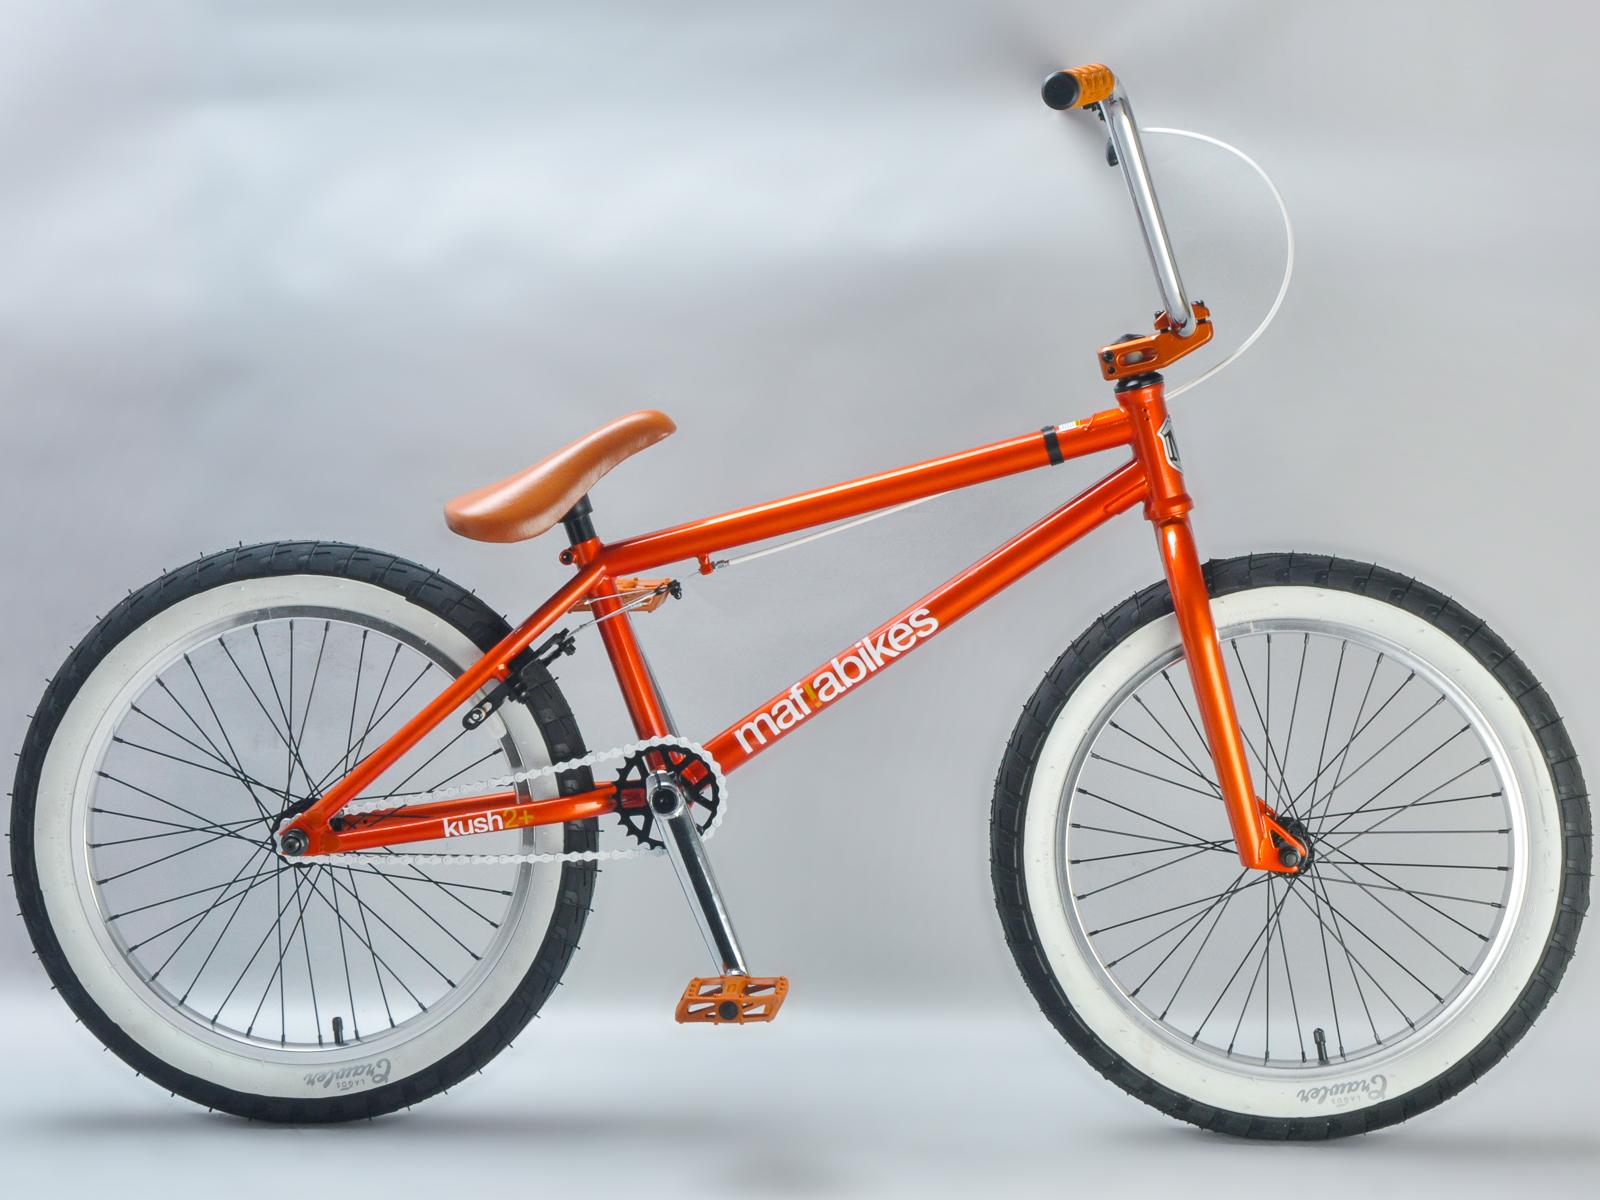 20 Zoll mafiabikes BMX Bike Kush 2+ verschiedene Farbvarianten   eBay